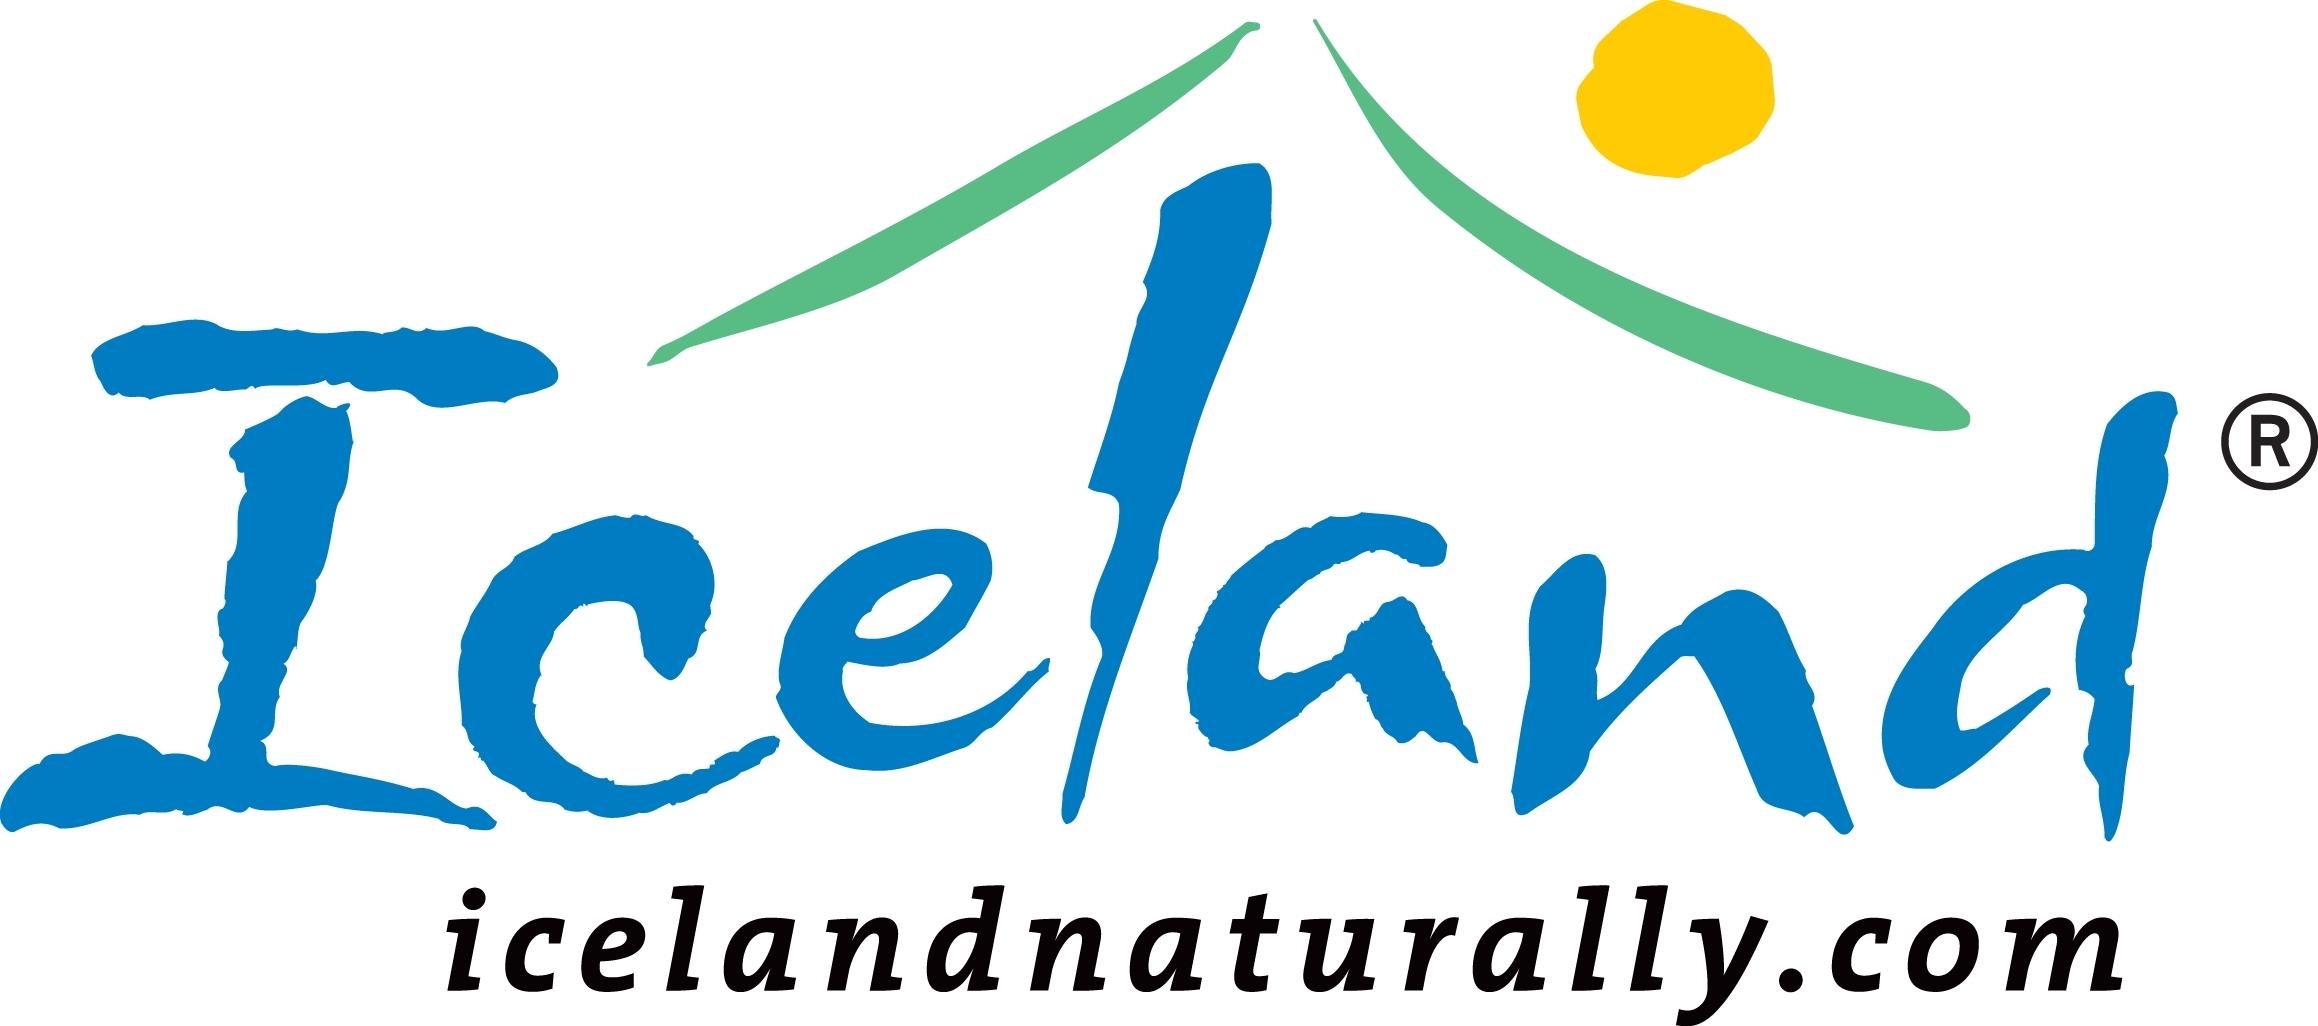 Iceland Naturally Logo